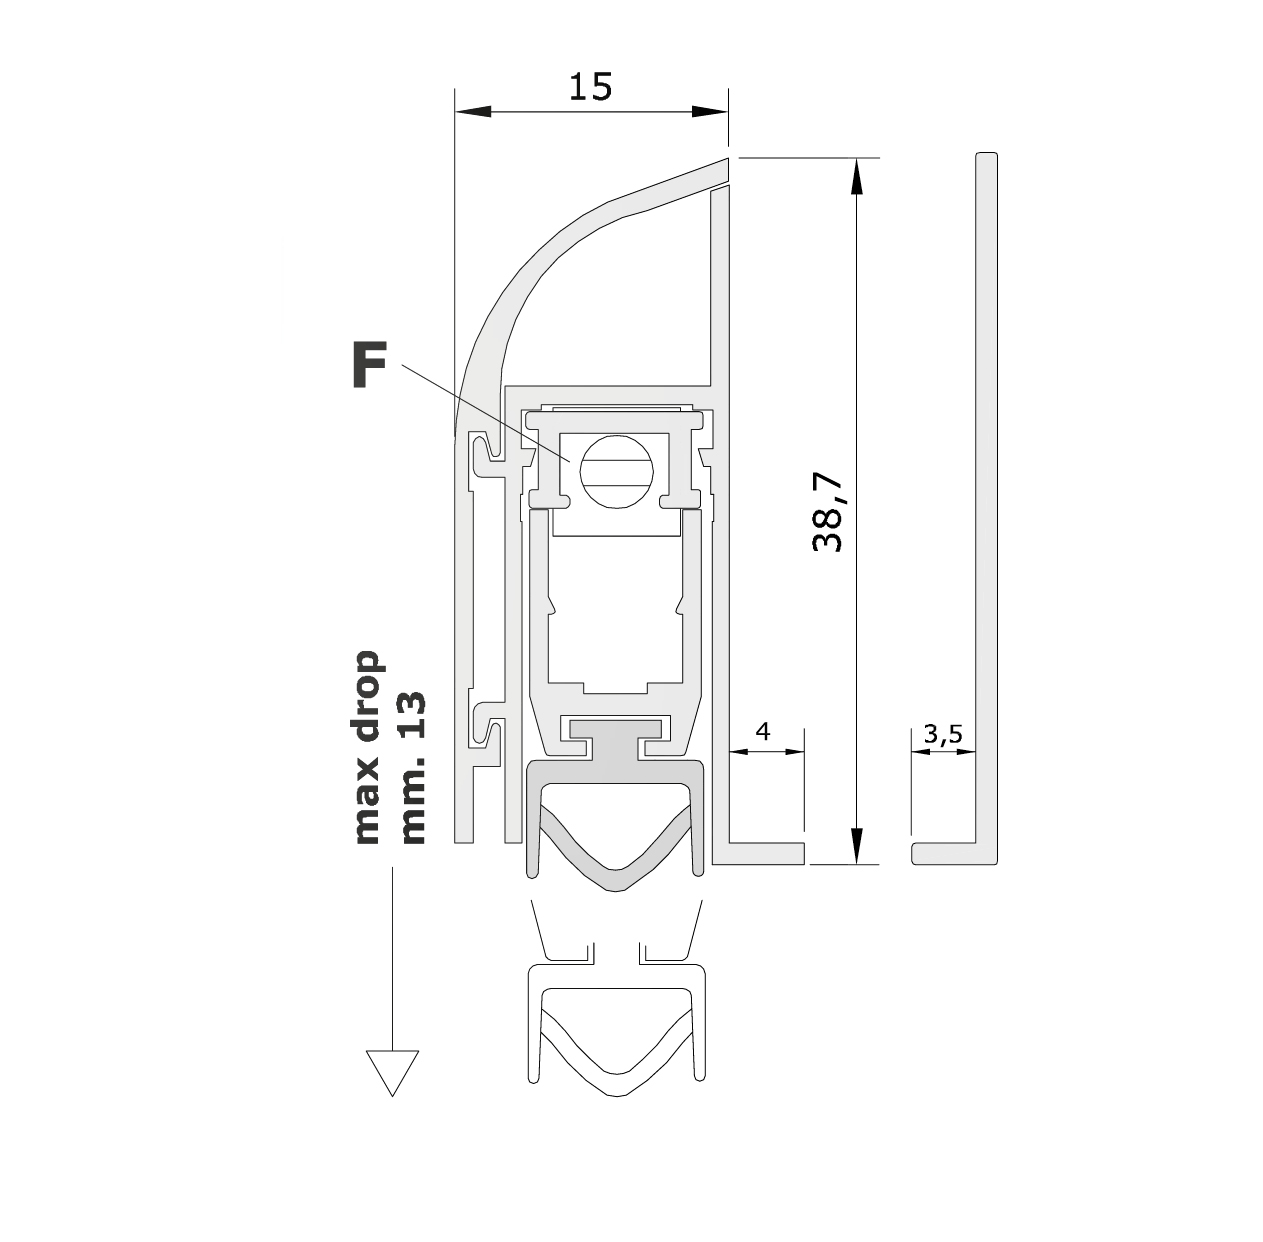 Misure standard (mm) per il paraspifferi Serie Comax 1460